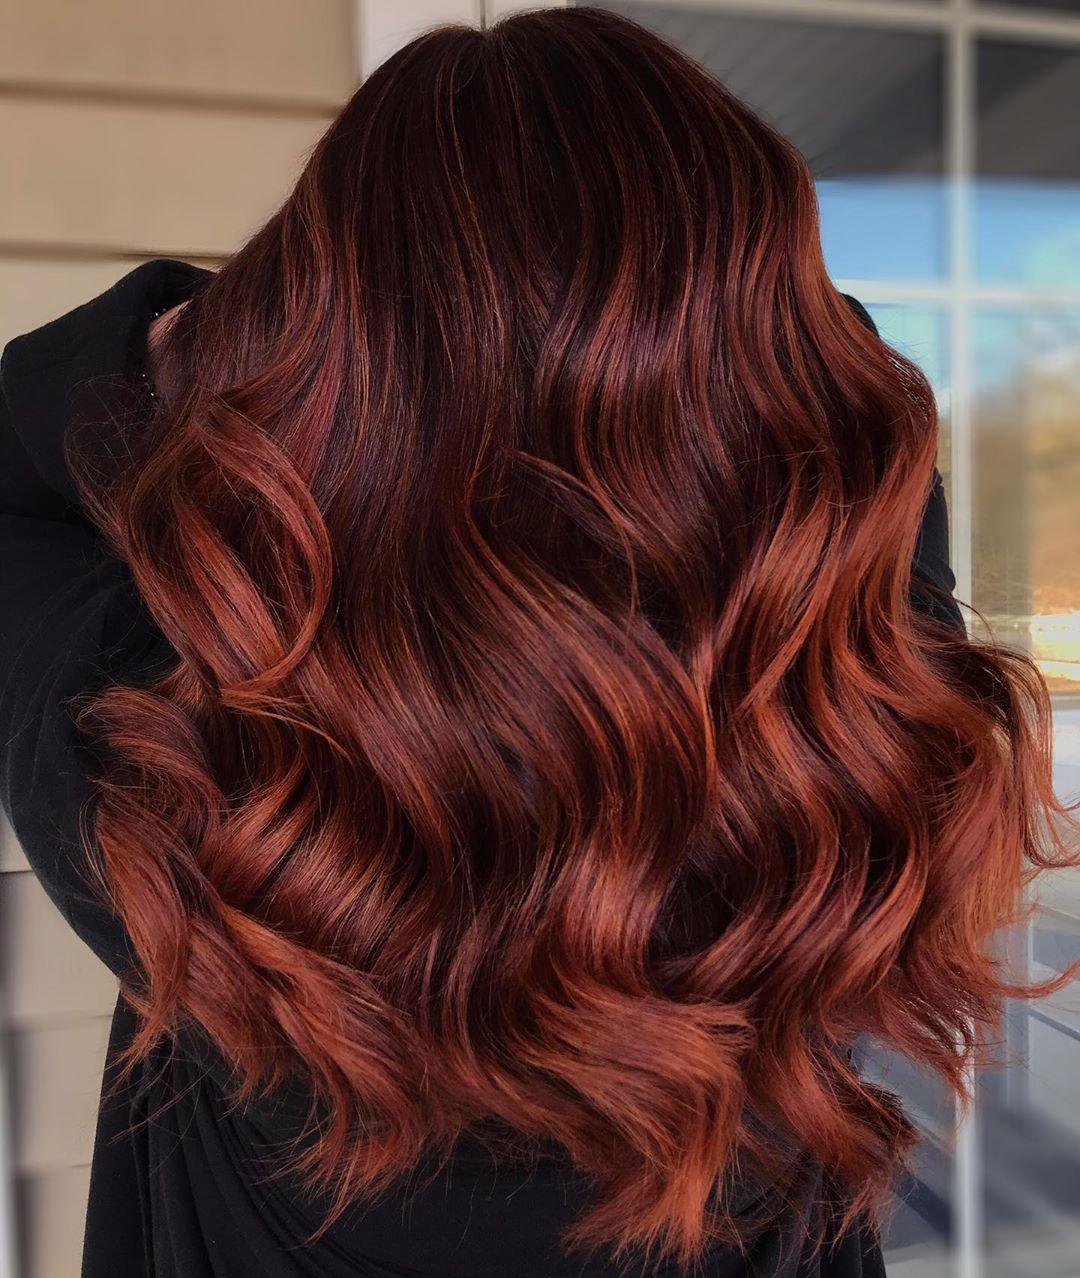 Rusty Balayage Hair